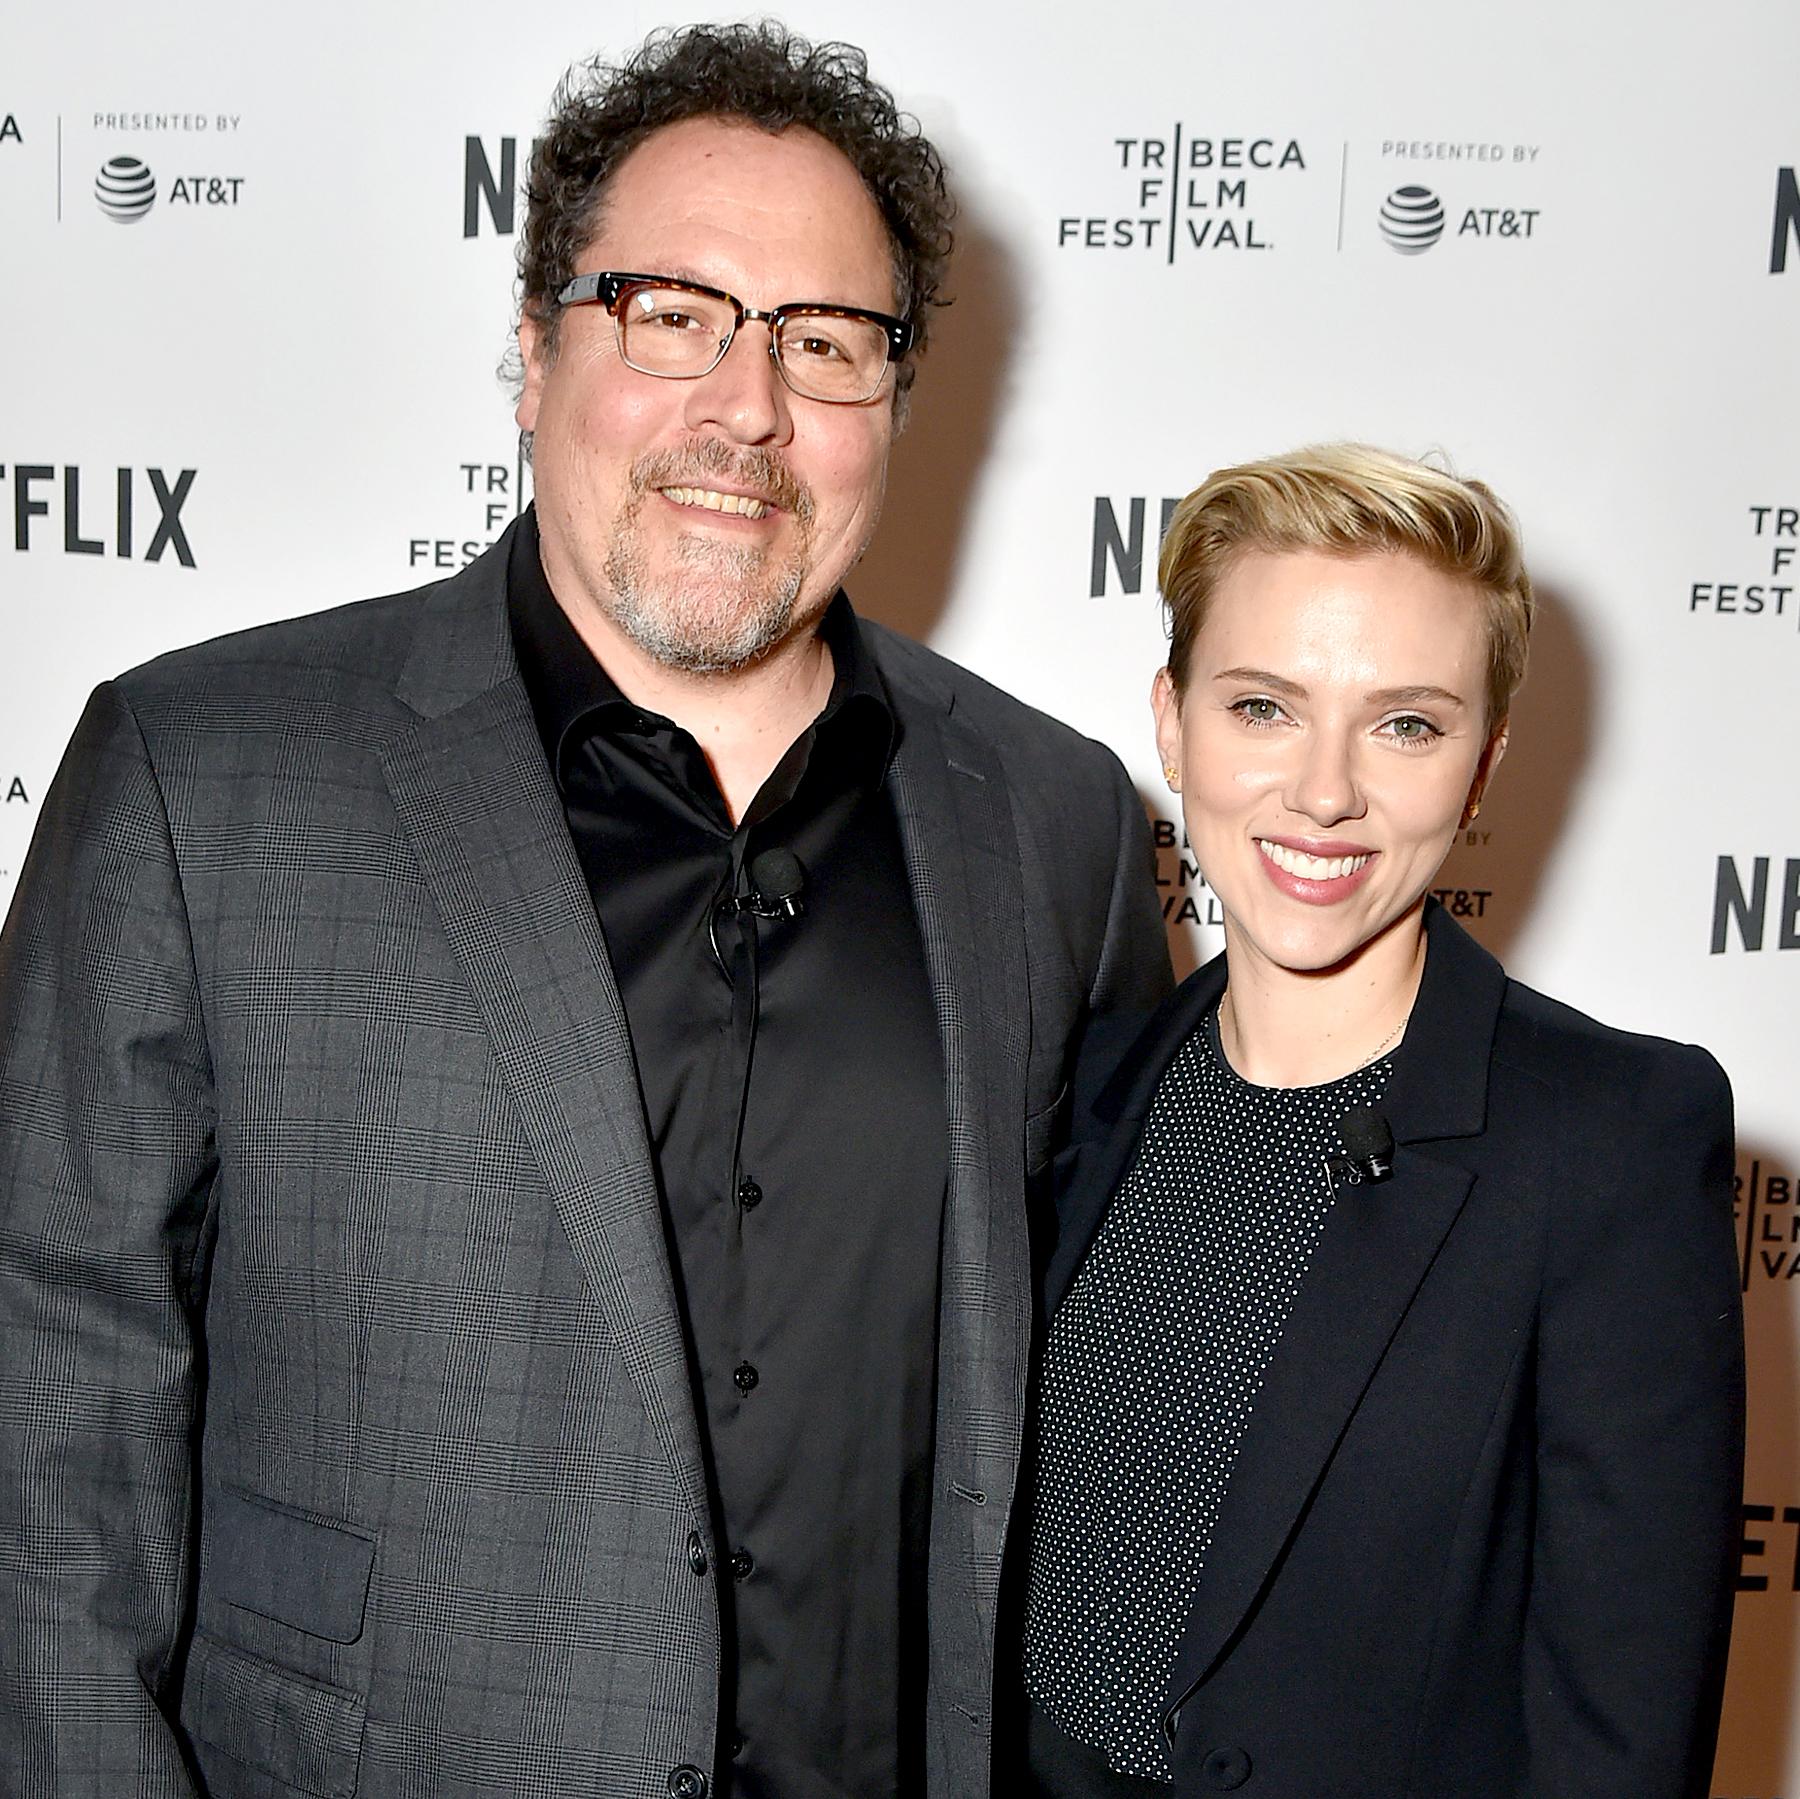 Jon Favreau and Scarlett Johansson attend Tribeca Talks: Jon Favreau with Scarlett Johansson during 2017 Tribeca Film Festival at SVA Theatre on April 21, 2017 in New York City.